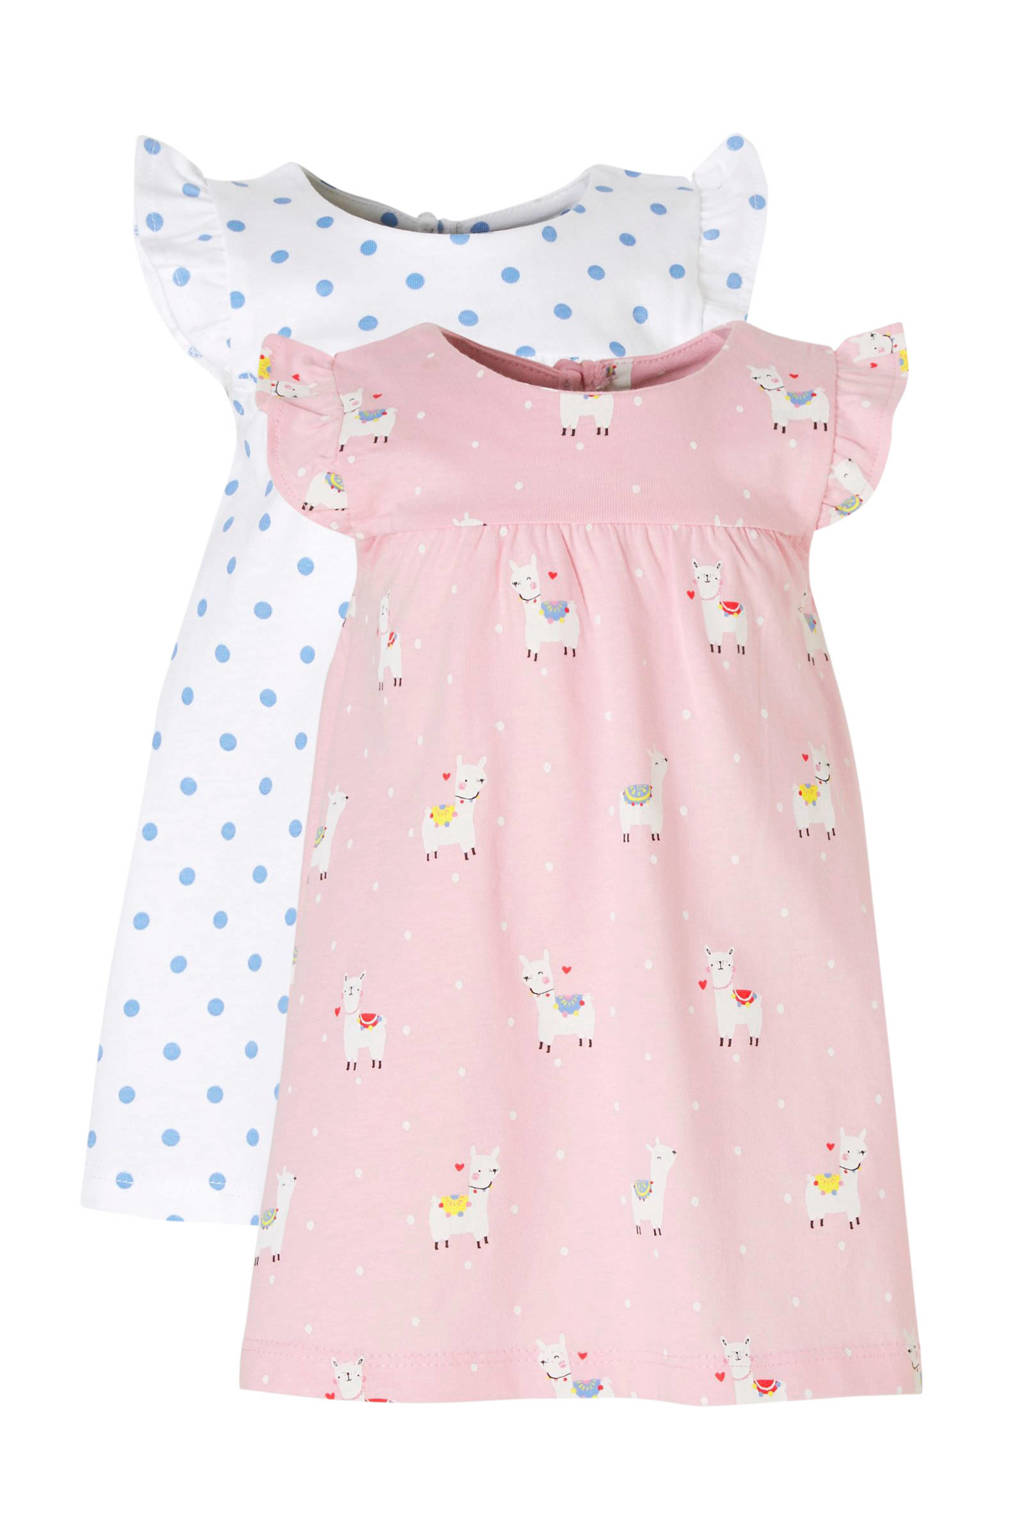 C&A Palomino jurk - set van 2, Lichtroze/wit/blauw